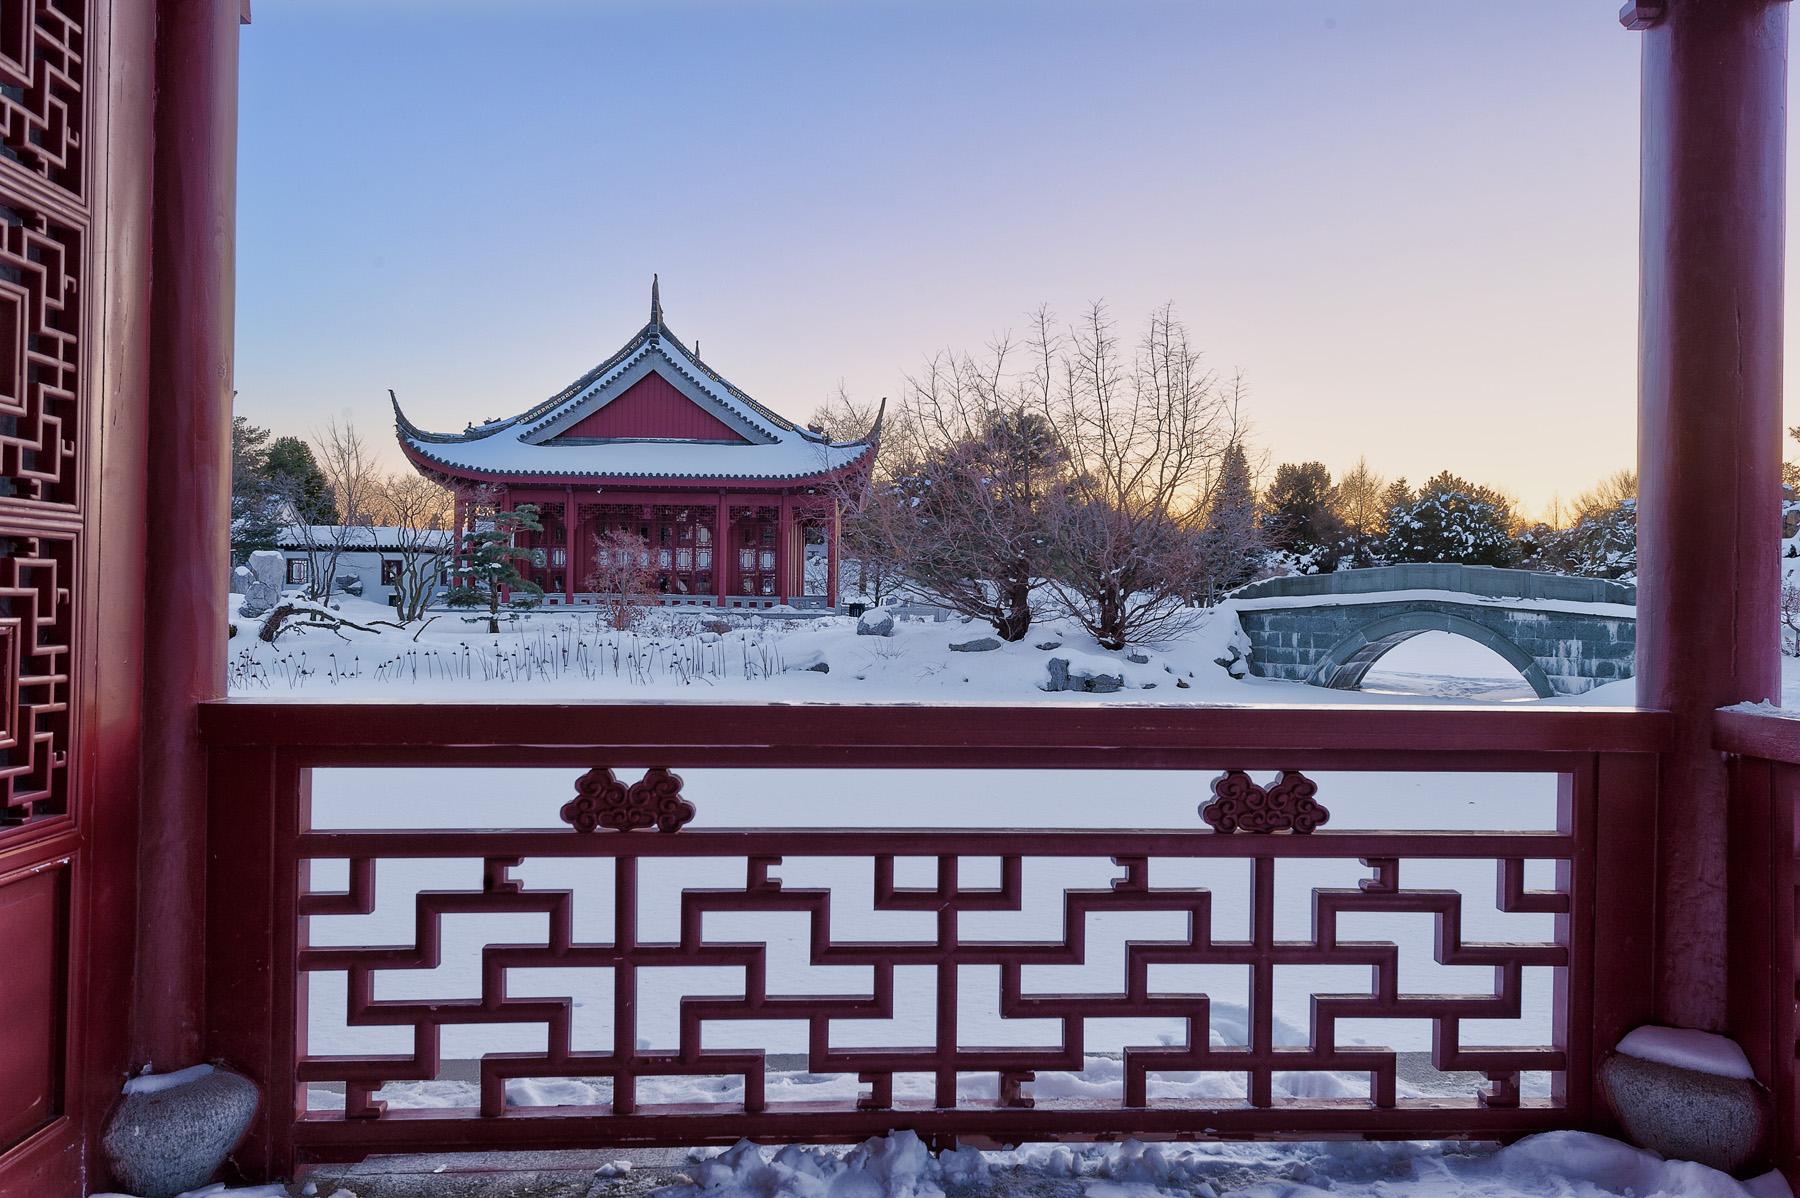 editorial-travel-montreal-botanical-garden-snow-winter-dusk-004